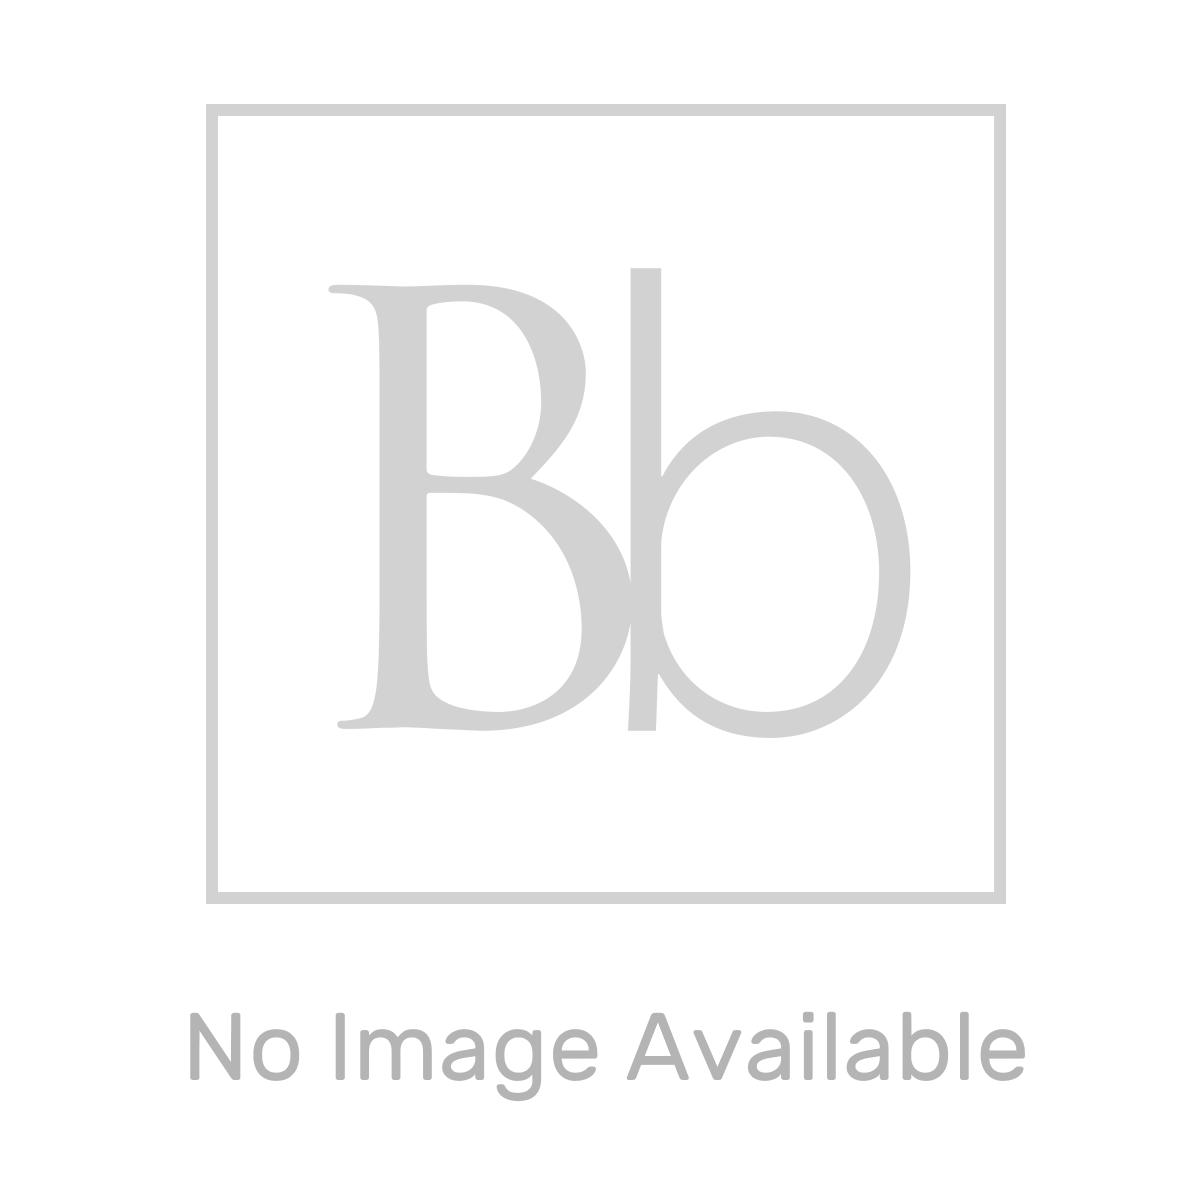 Salamander CT FORCE 20 PT Brass Twin Ended Positive Head Shower Pump Front